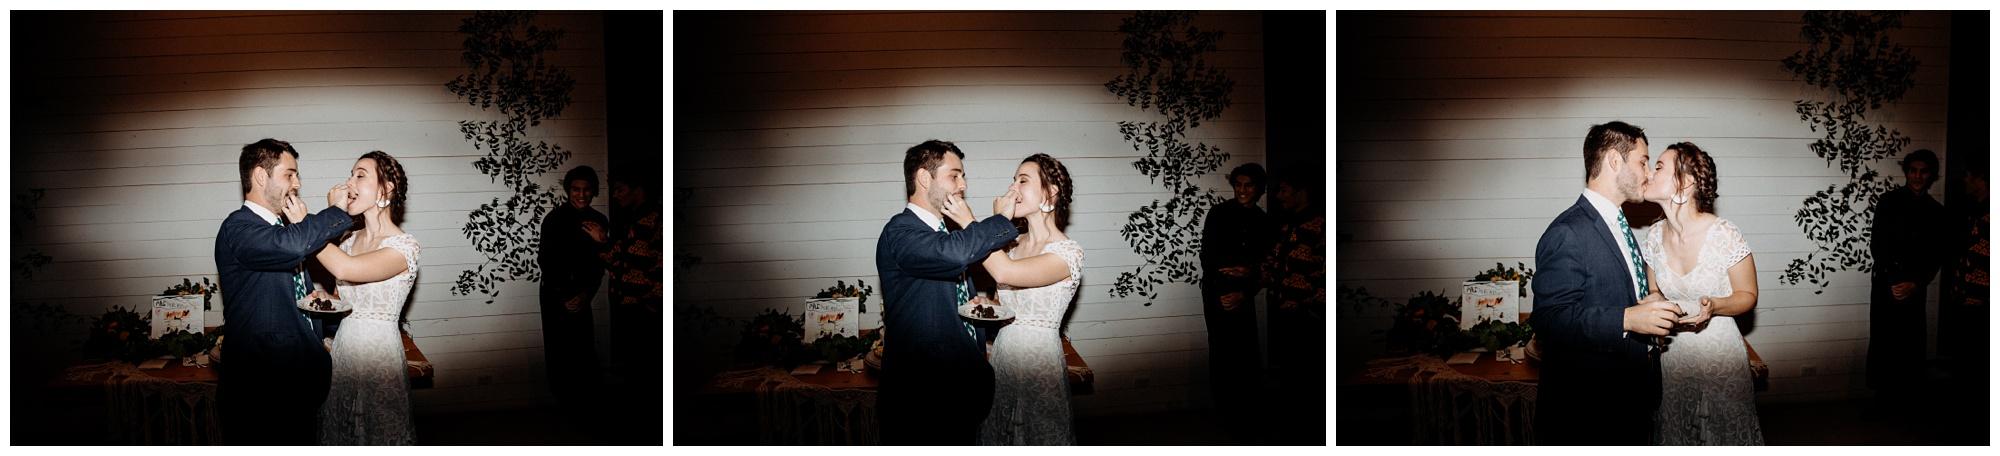 AUSTIN-TEXAS-PROSPECT-HOUSE-WEDDING-VENUE-PHOTOGRAPHY25849.JPG